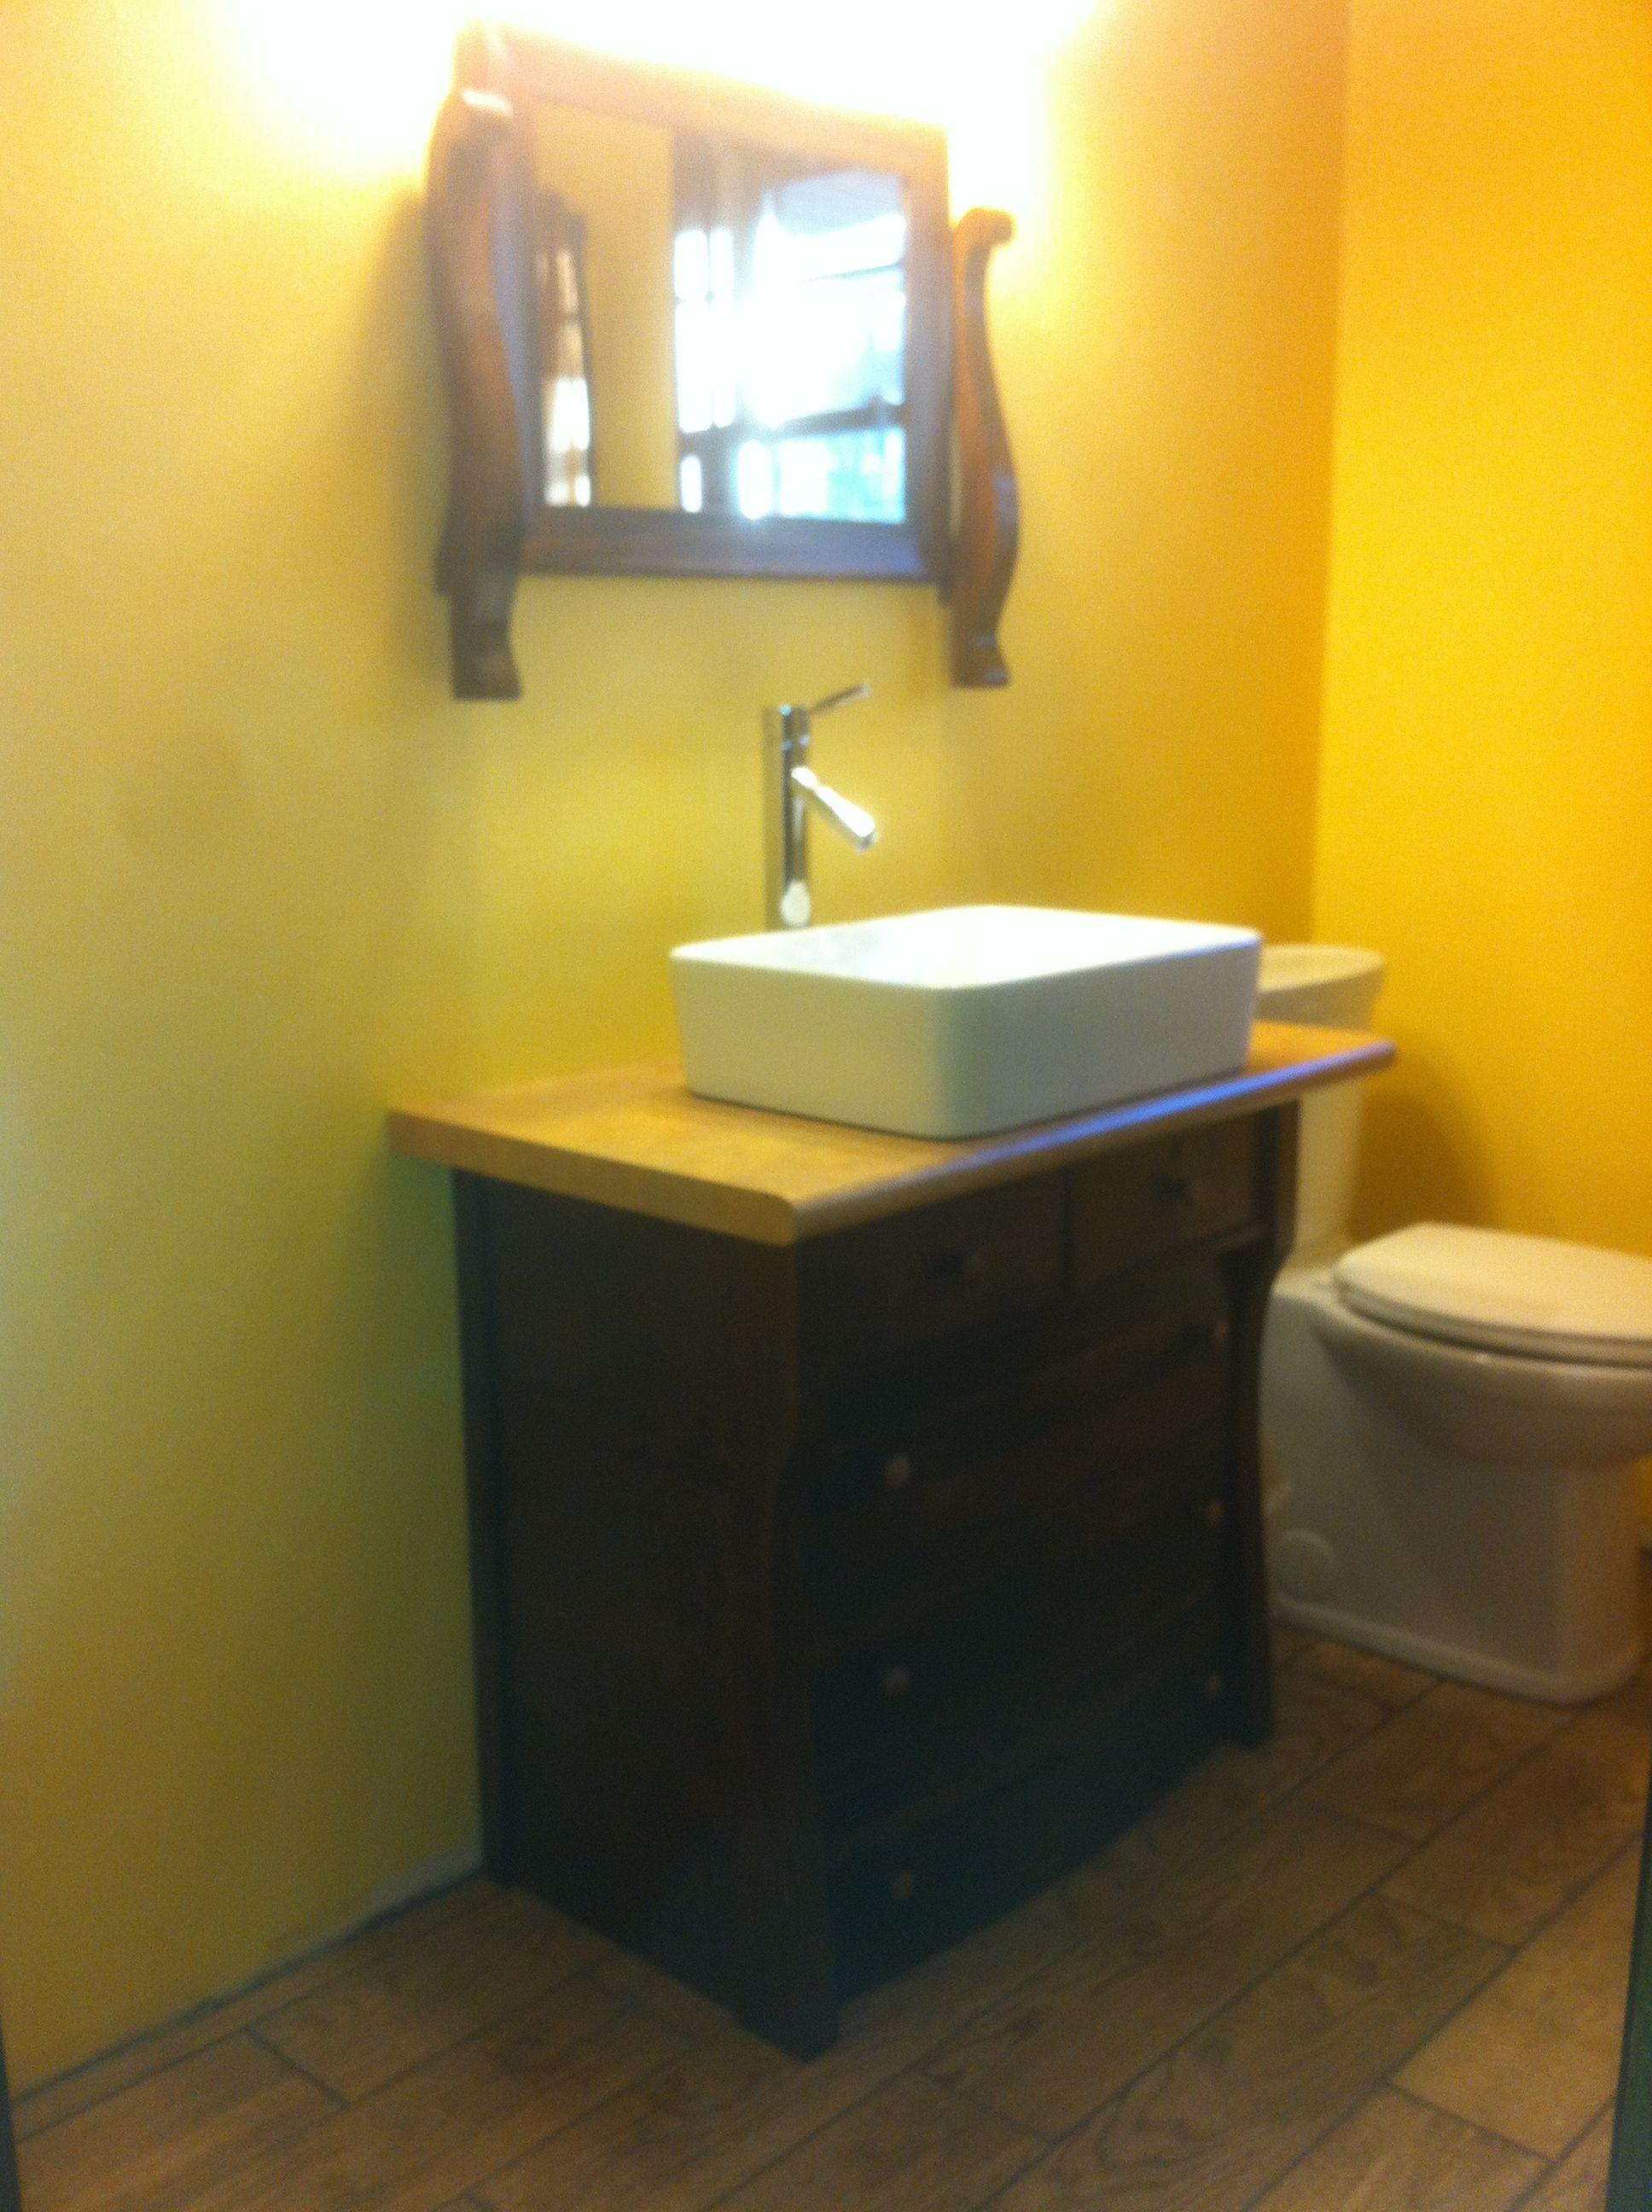 Old refurbished dresser/mirror turned bathroom vanity ...